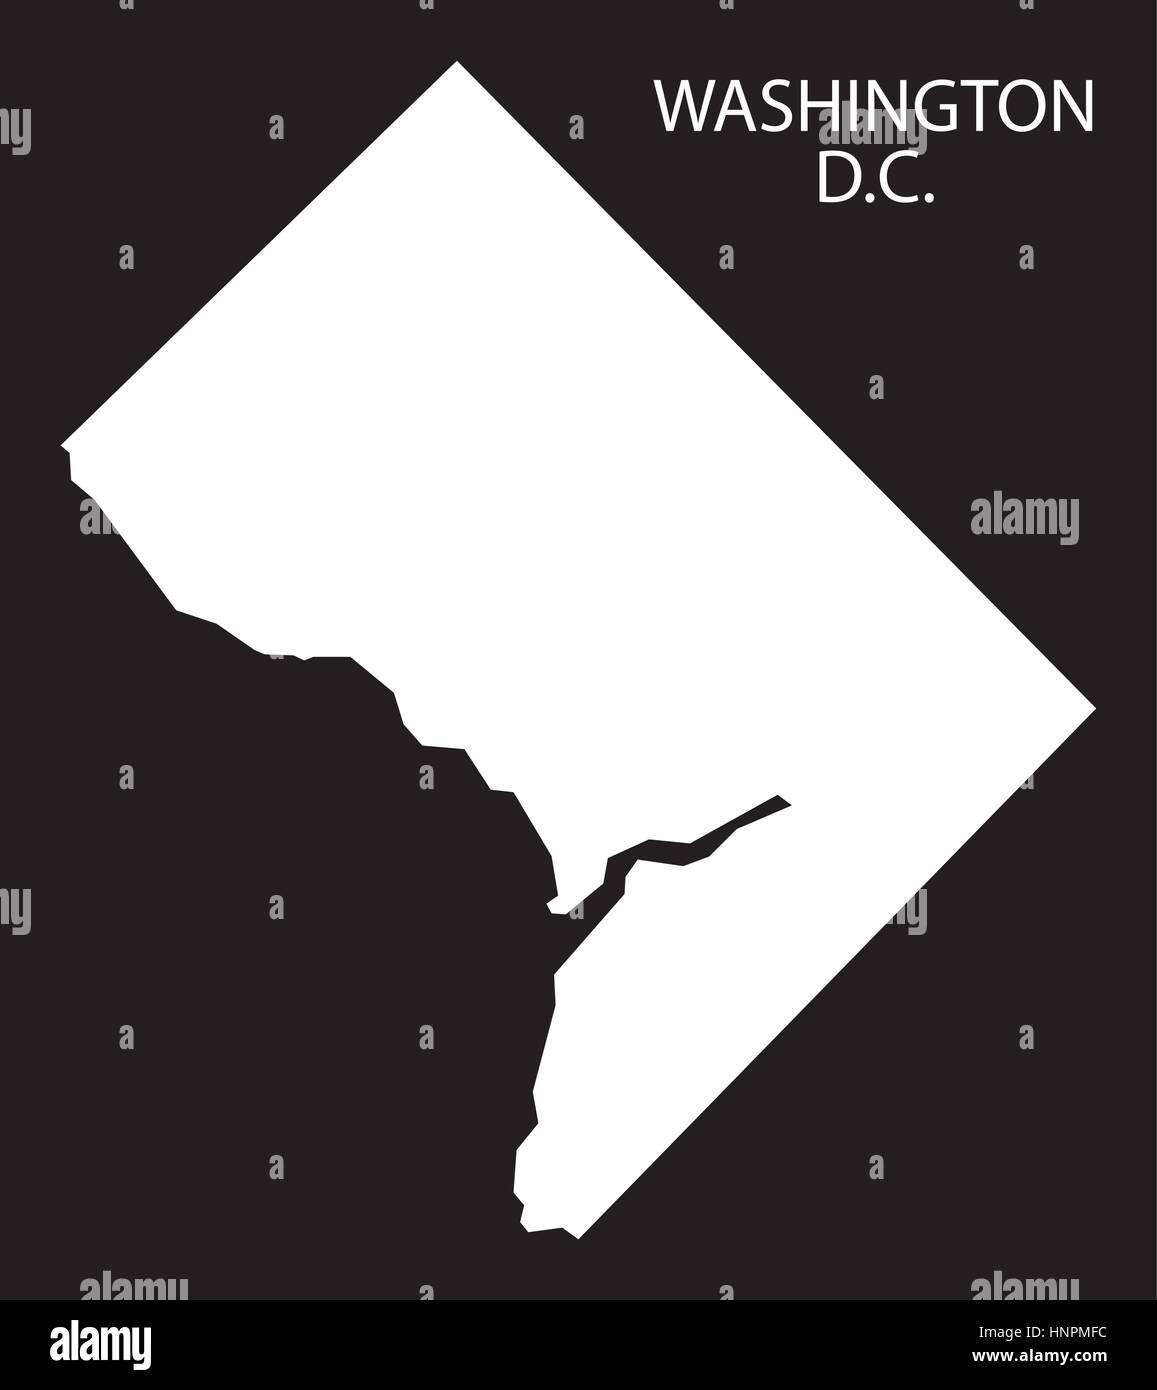 Washington Dc Usa Map Black Inverted Silhouette Stock Vector Art